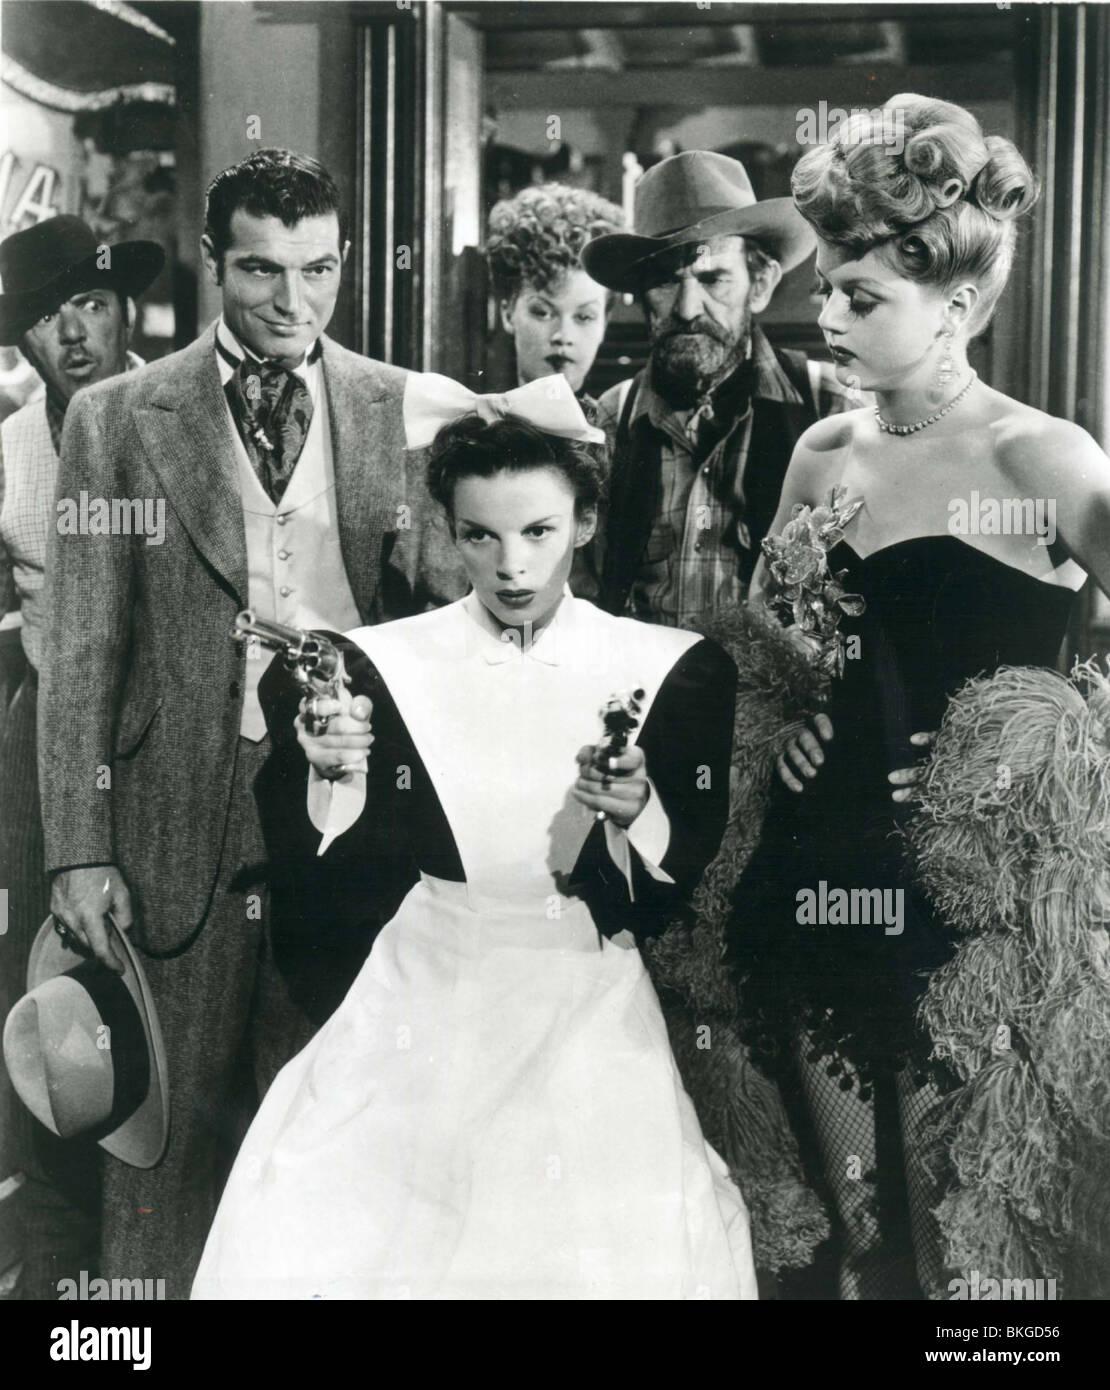 THE HARVEY GIRLS (1946) HORACE MCNALLY, JUDY GARLAND, ANGELA LANSBURY HRVG 001P - Stock Image